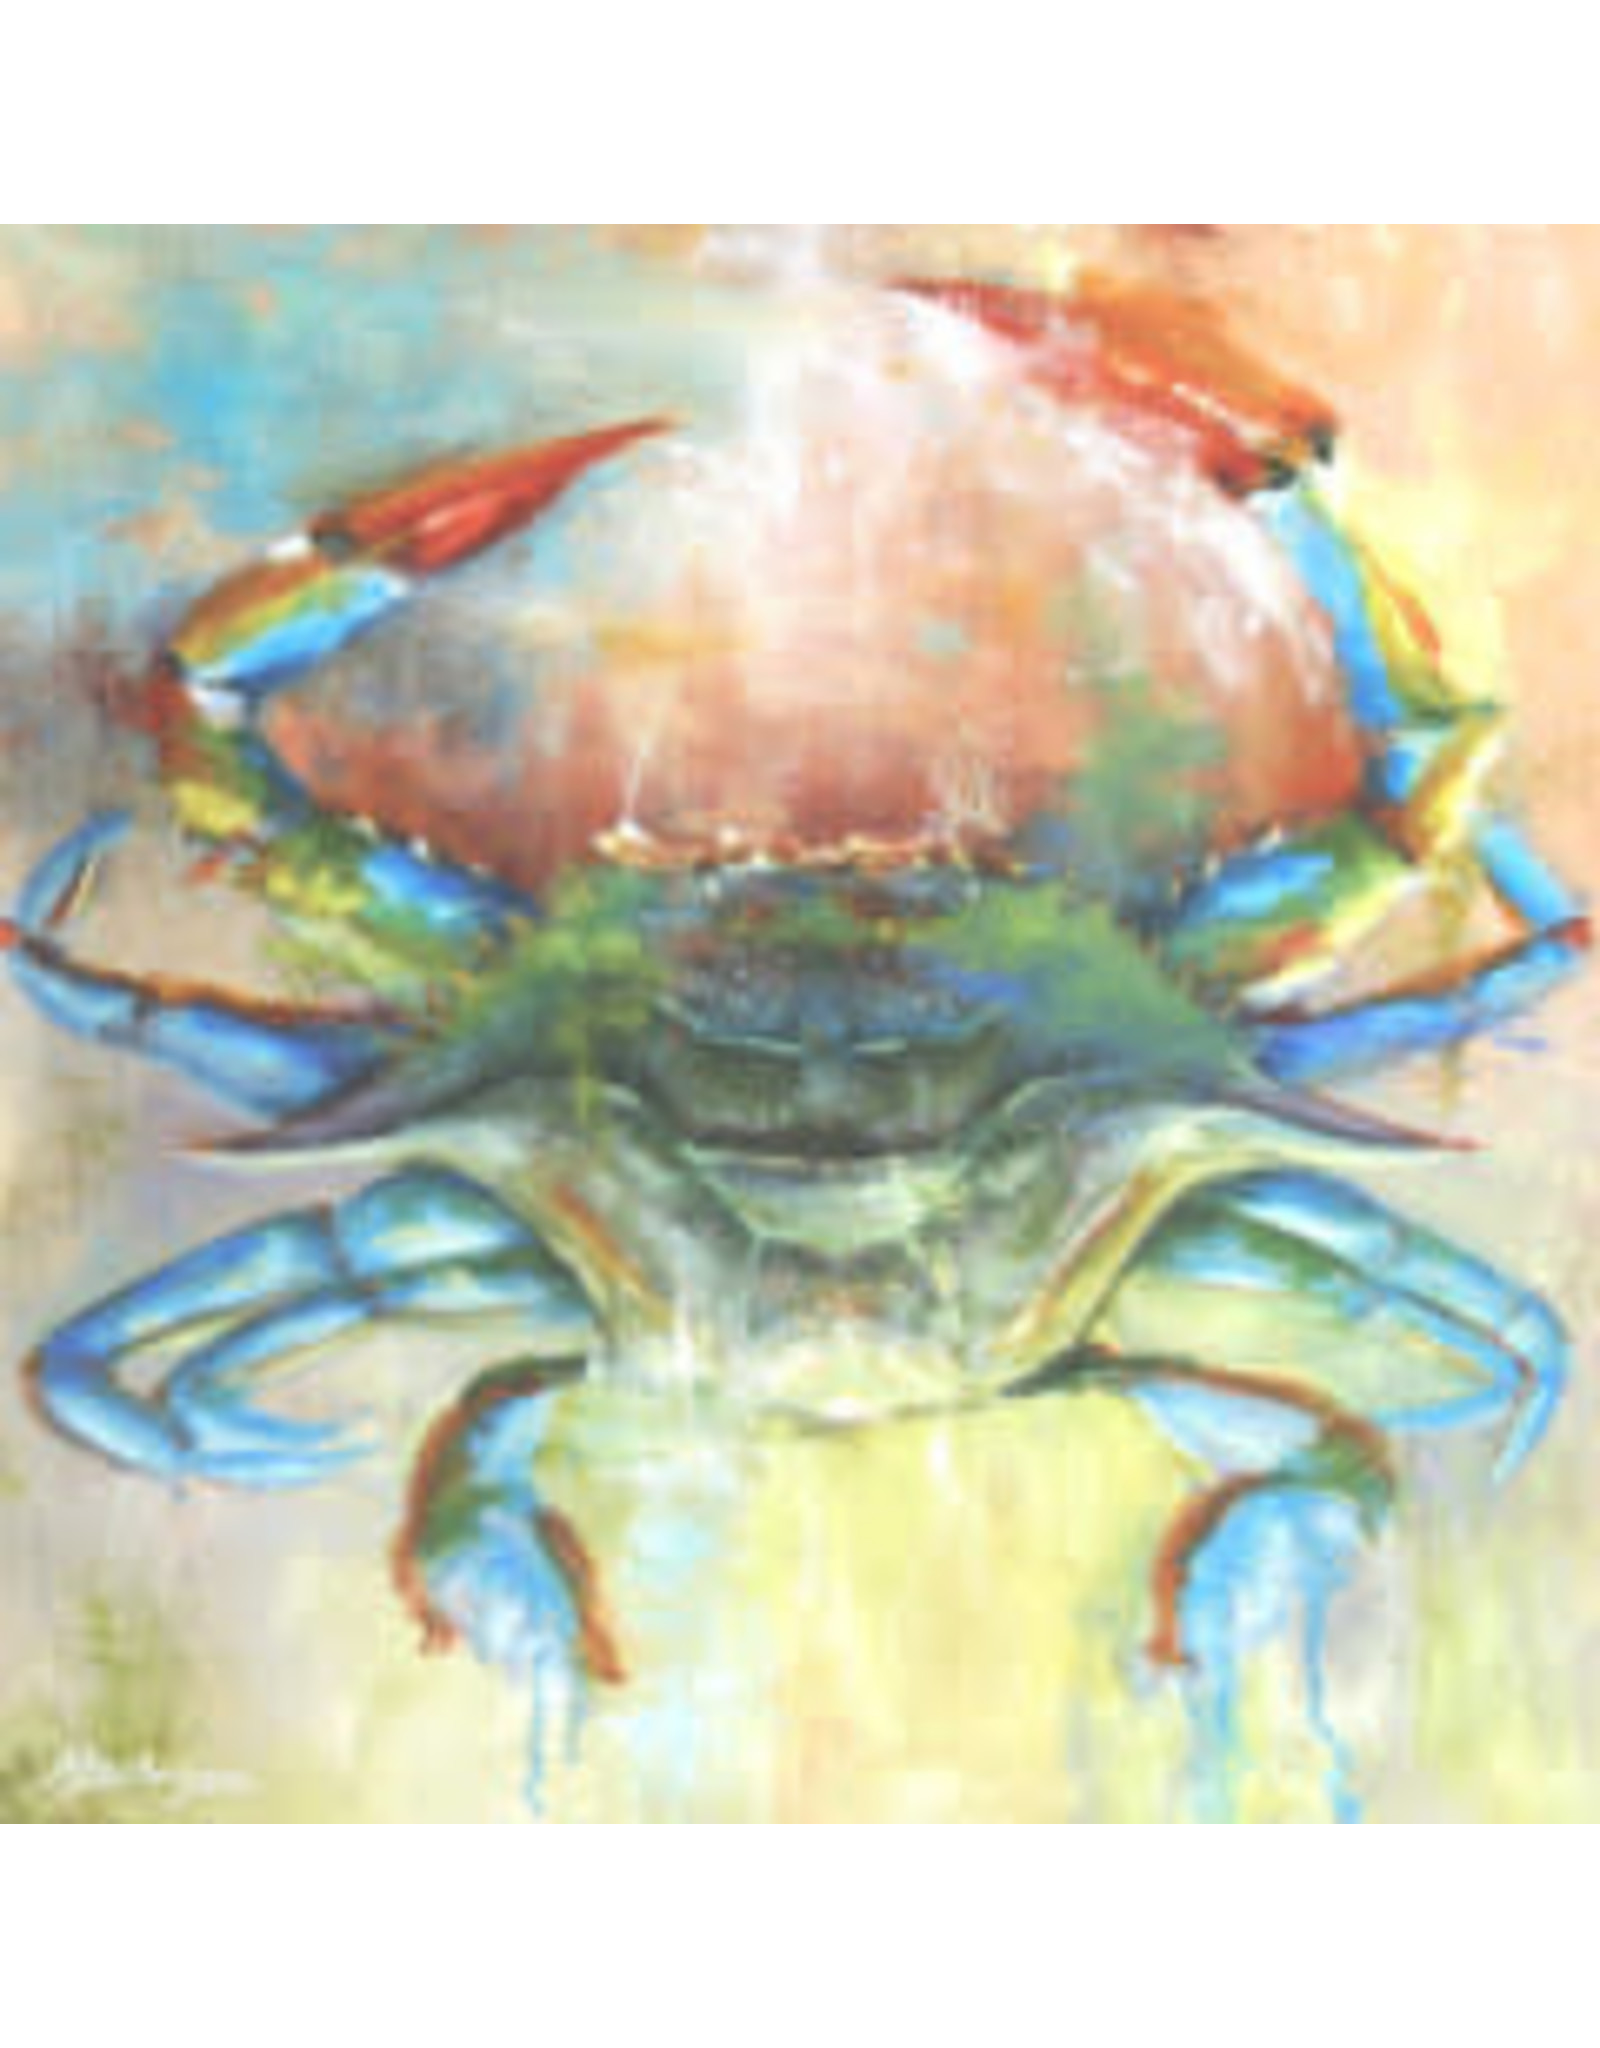 "Michaelann Bellerjeau COBALT CRAB, archival giclee on canvas,12x12"" MICB"